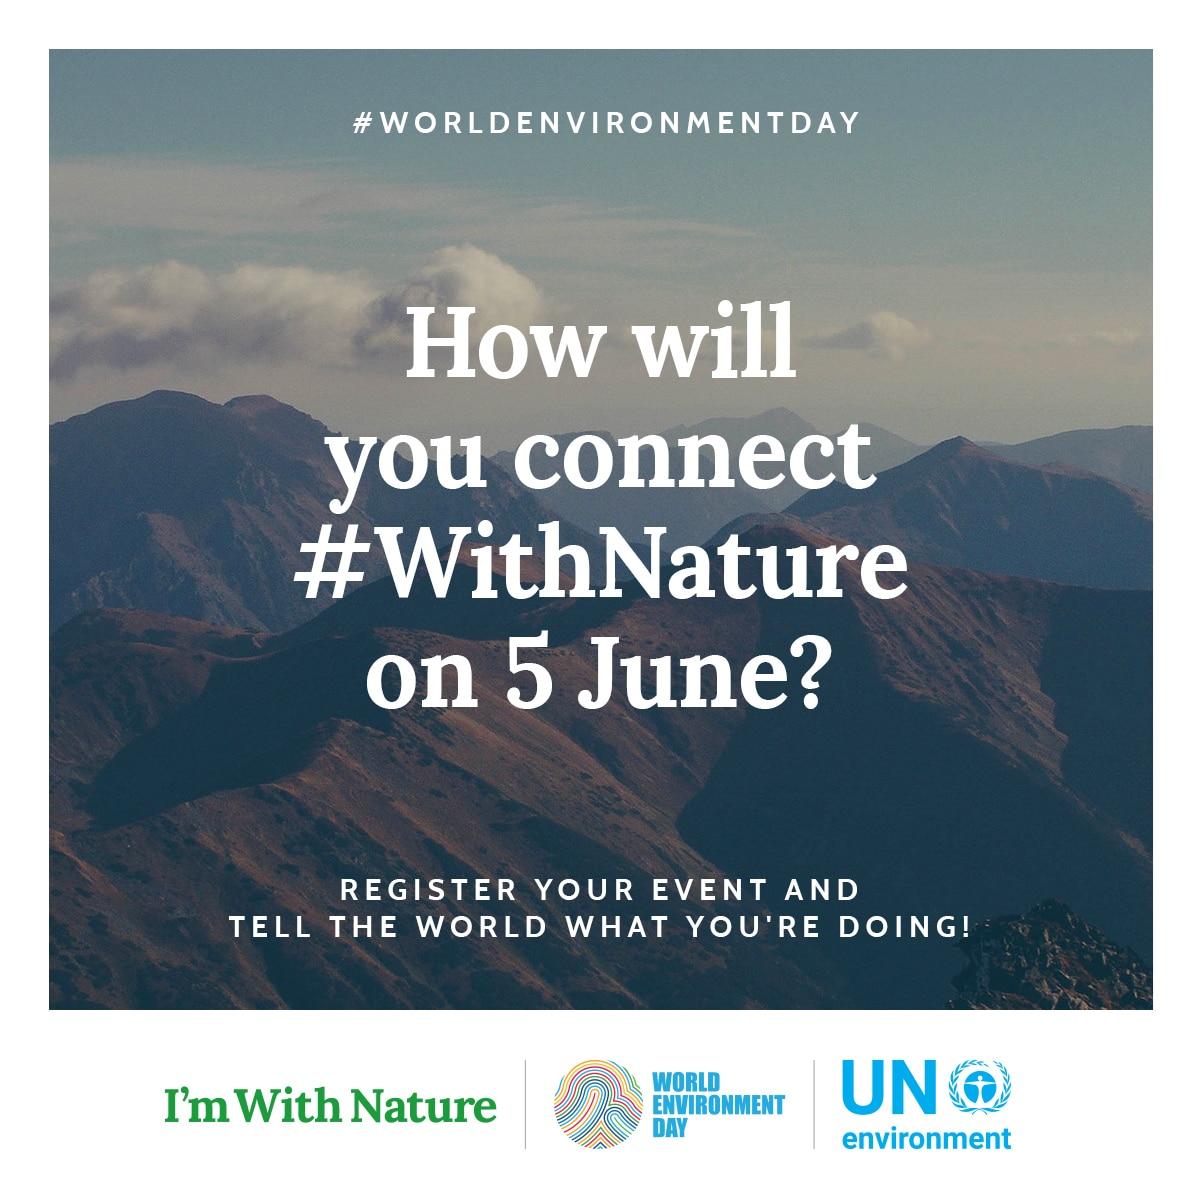 World Environment Day 5 June